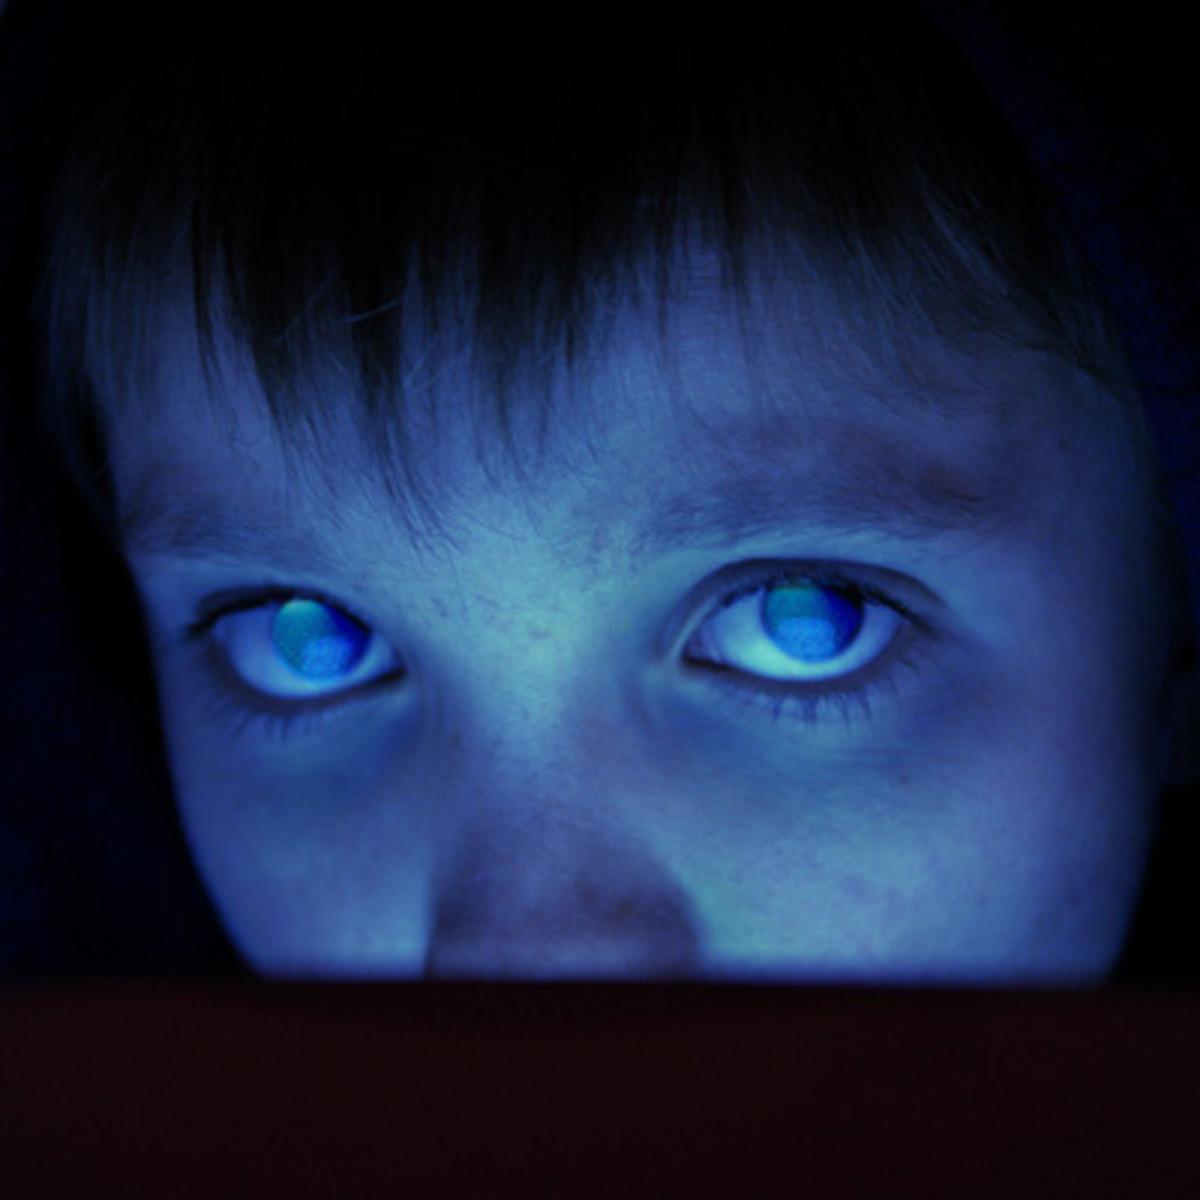 Unusual Phobias - Strange but True!